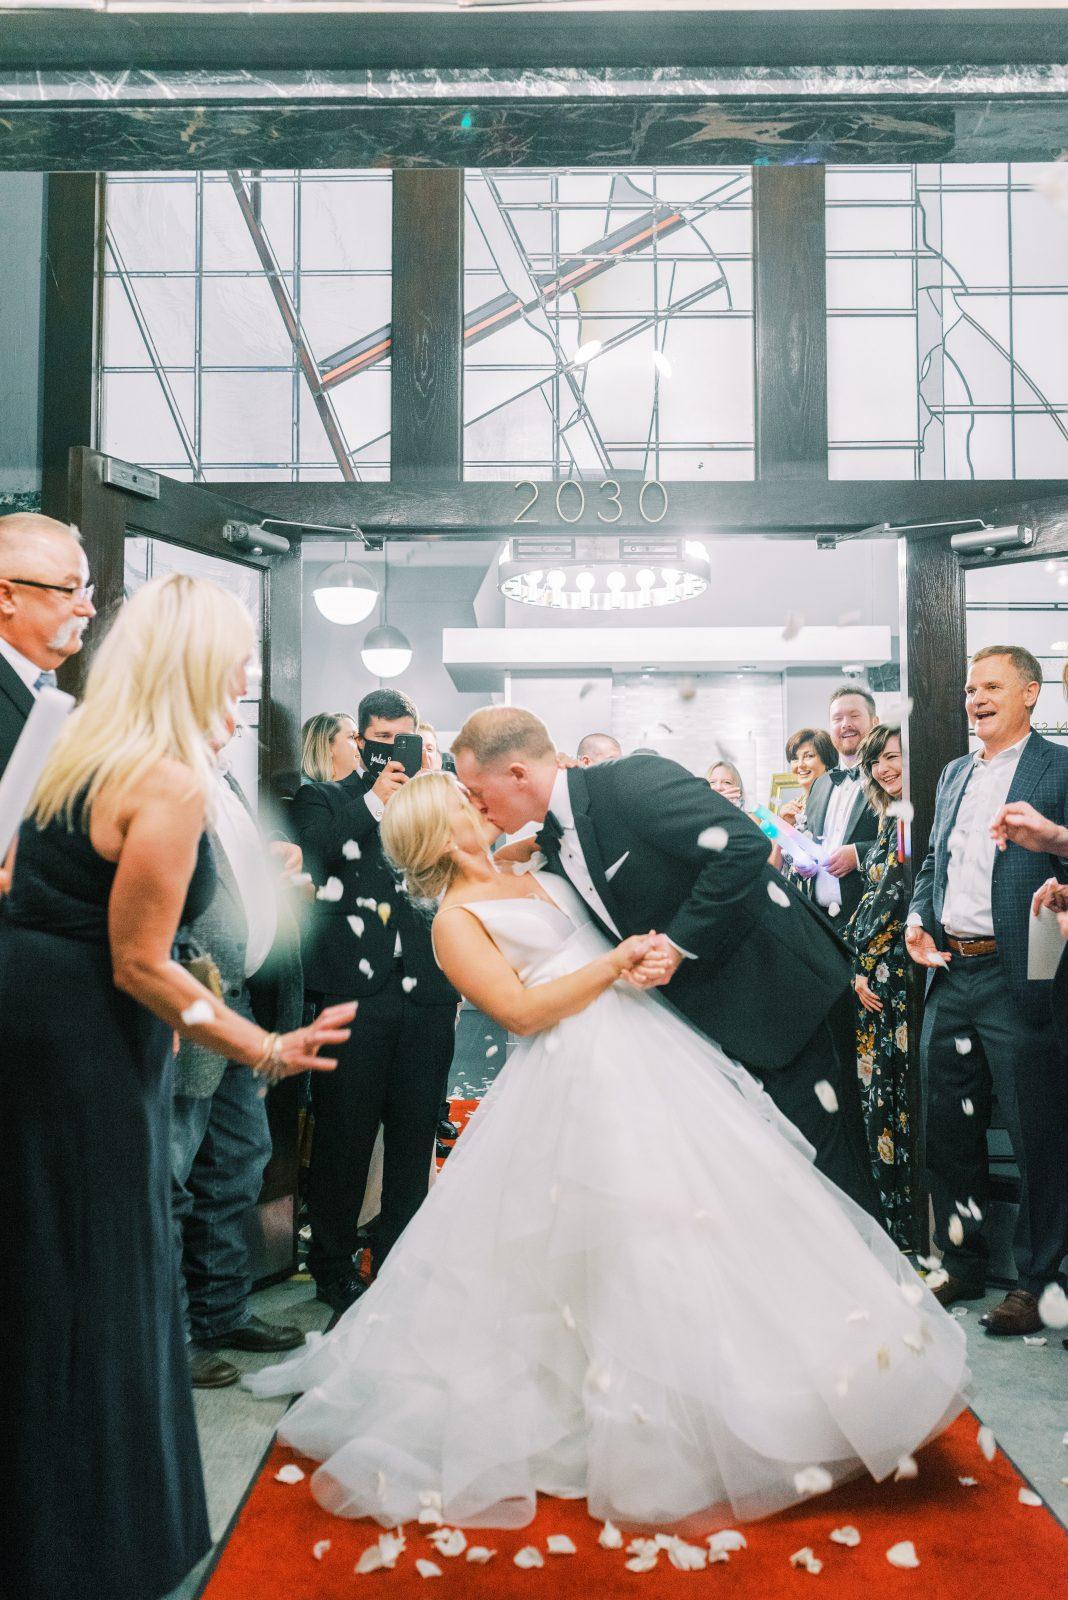 Classic wedding exit